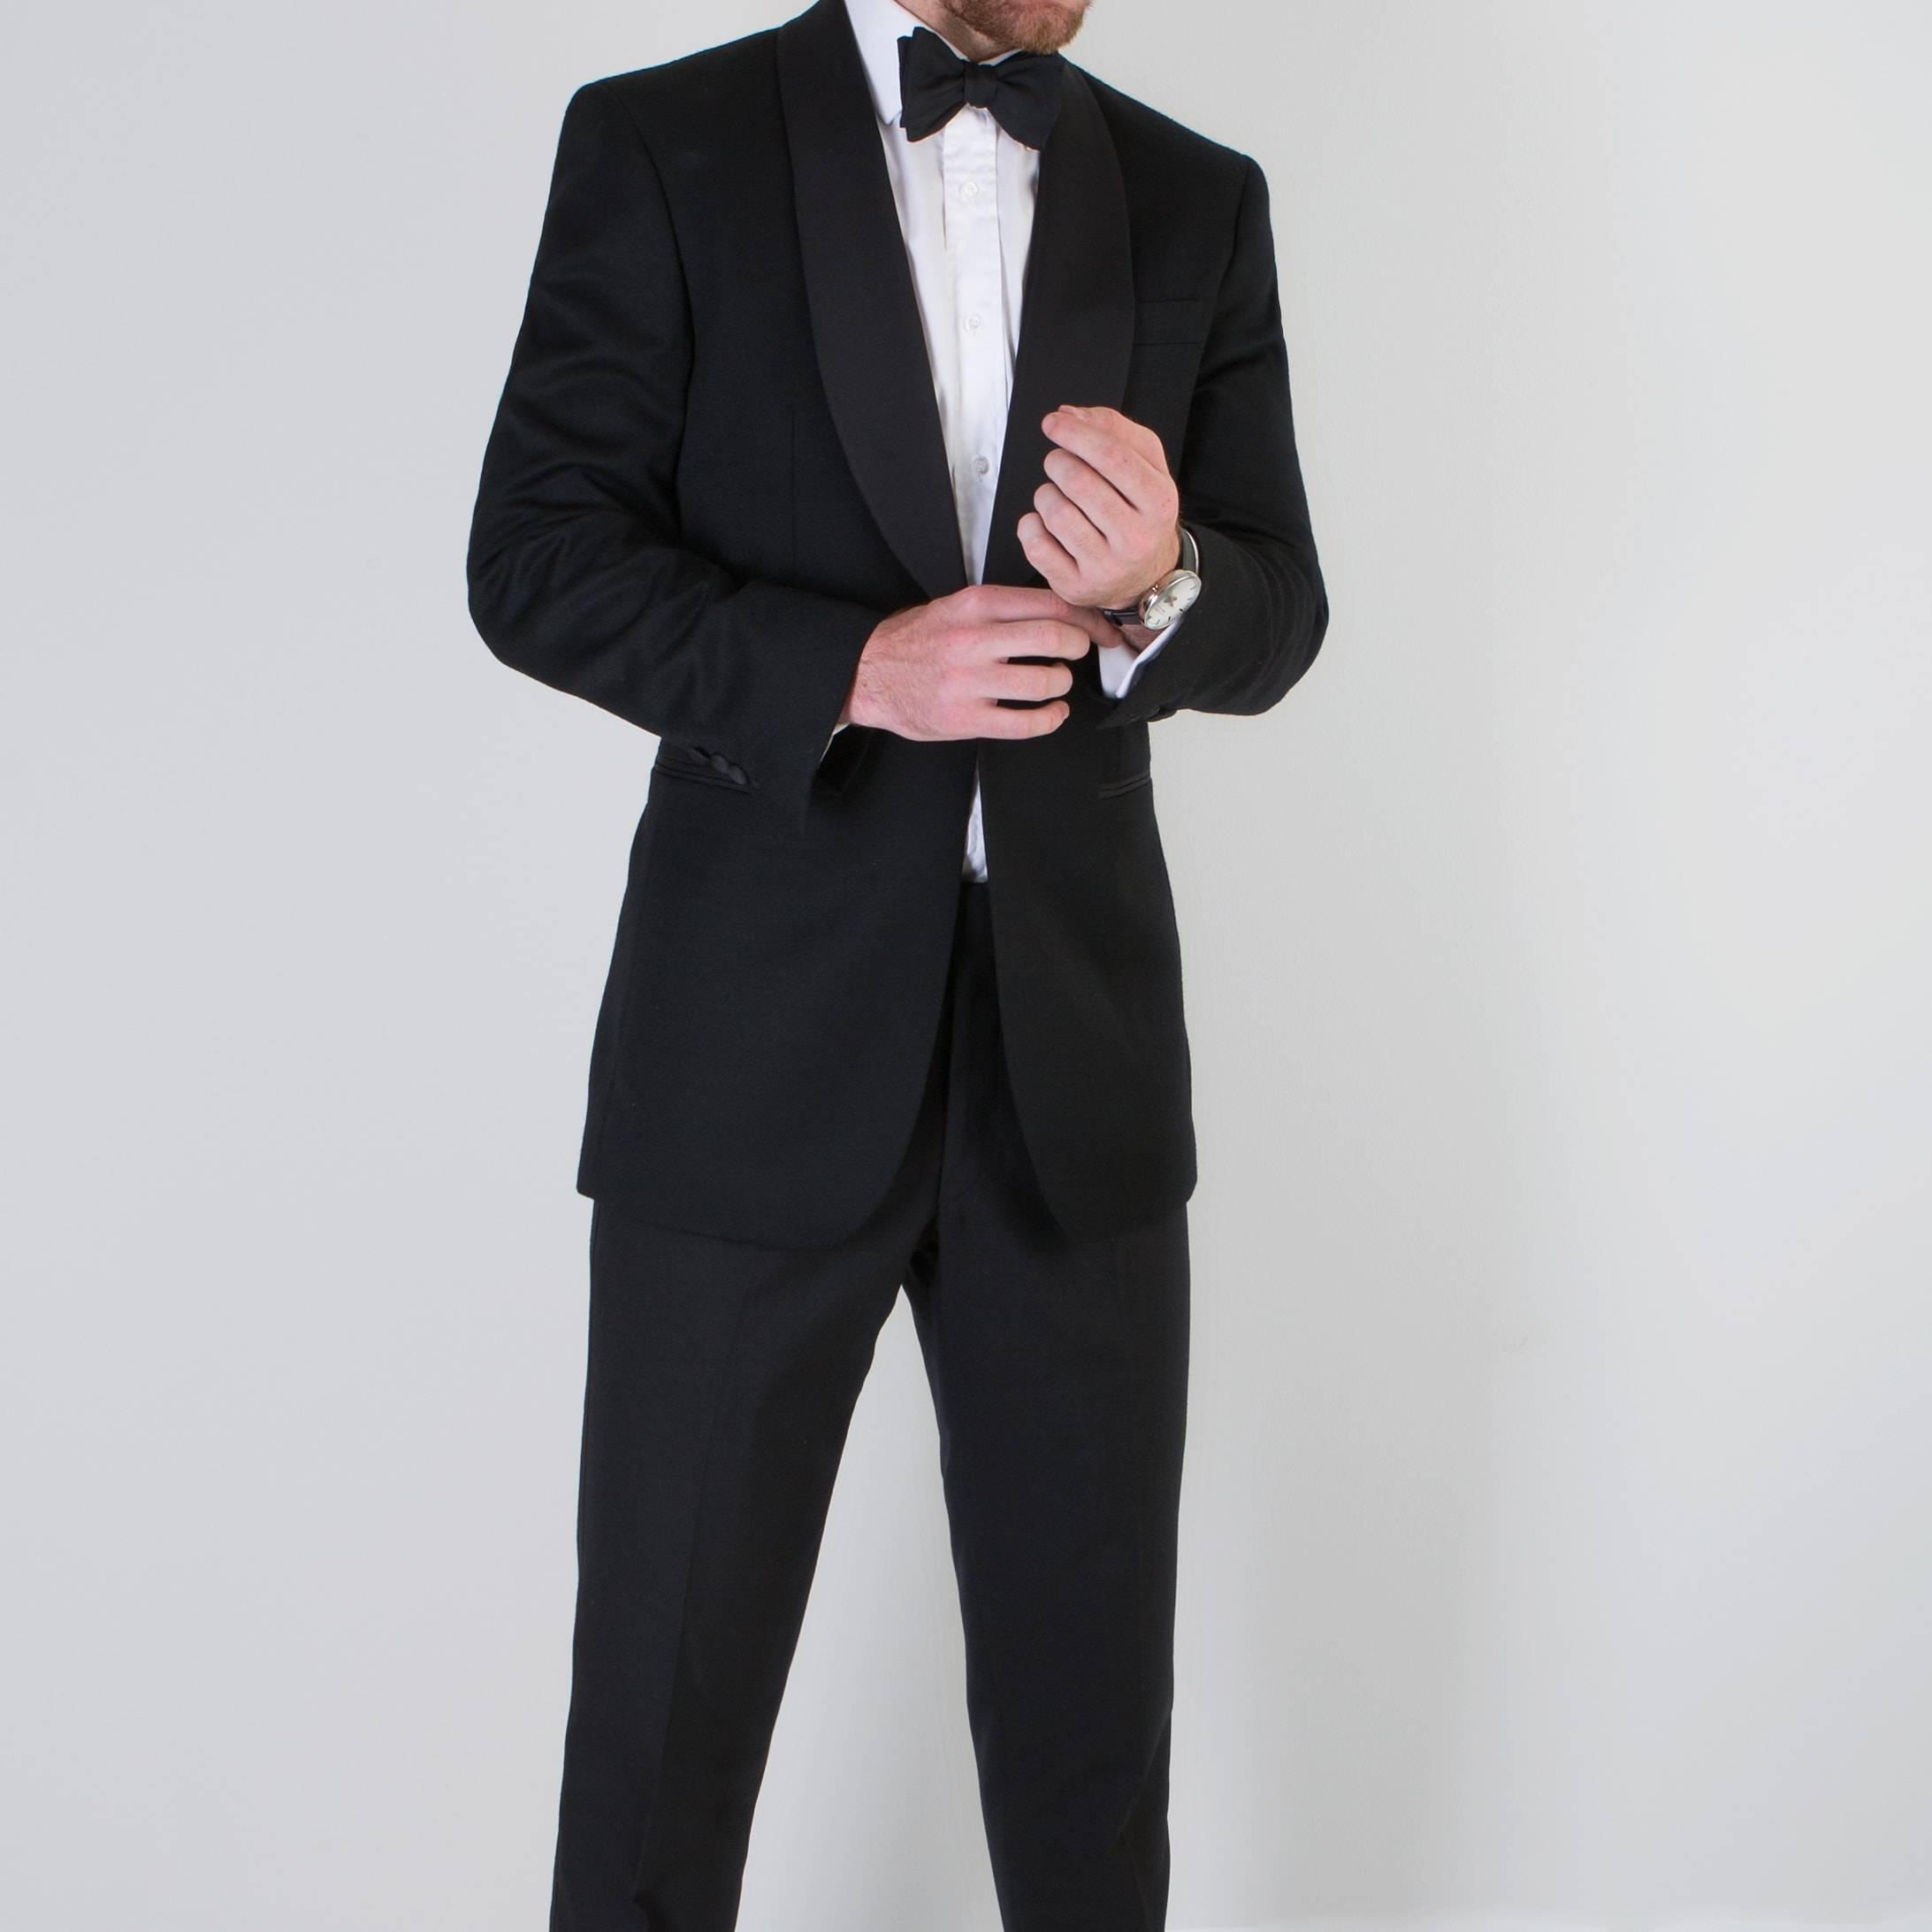 Gentleman wearing a Mullen and Mullen bespoke tailoring dinner suit